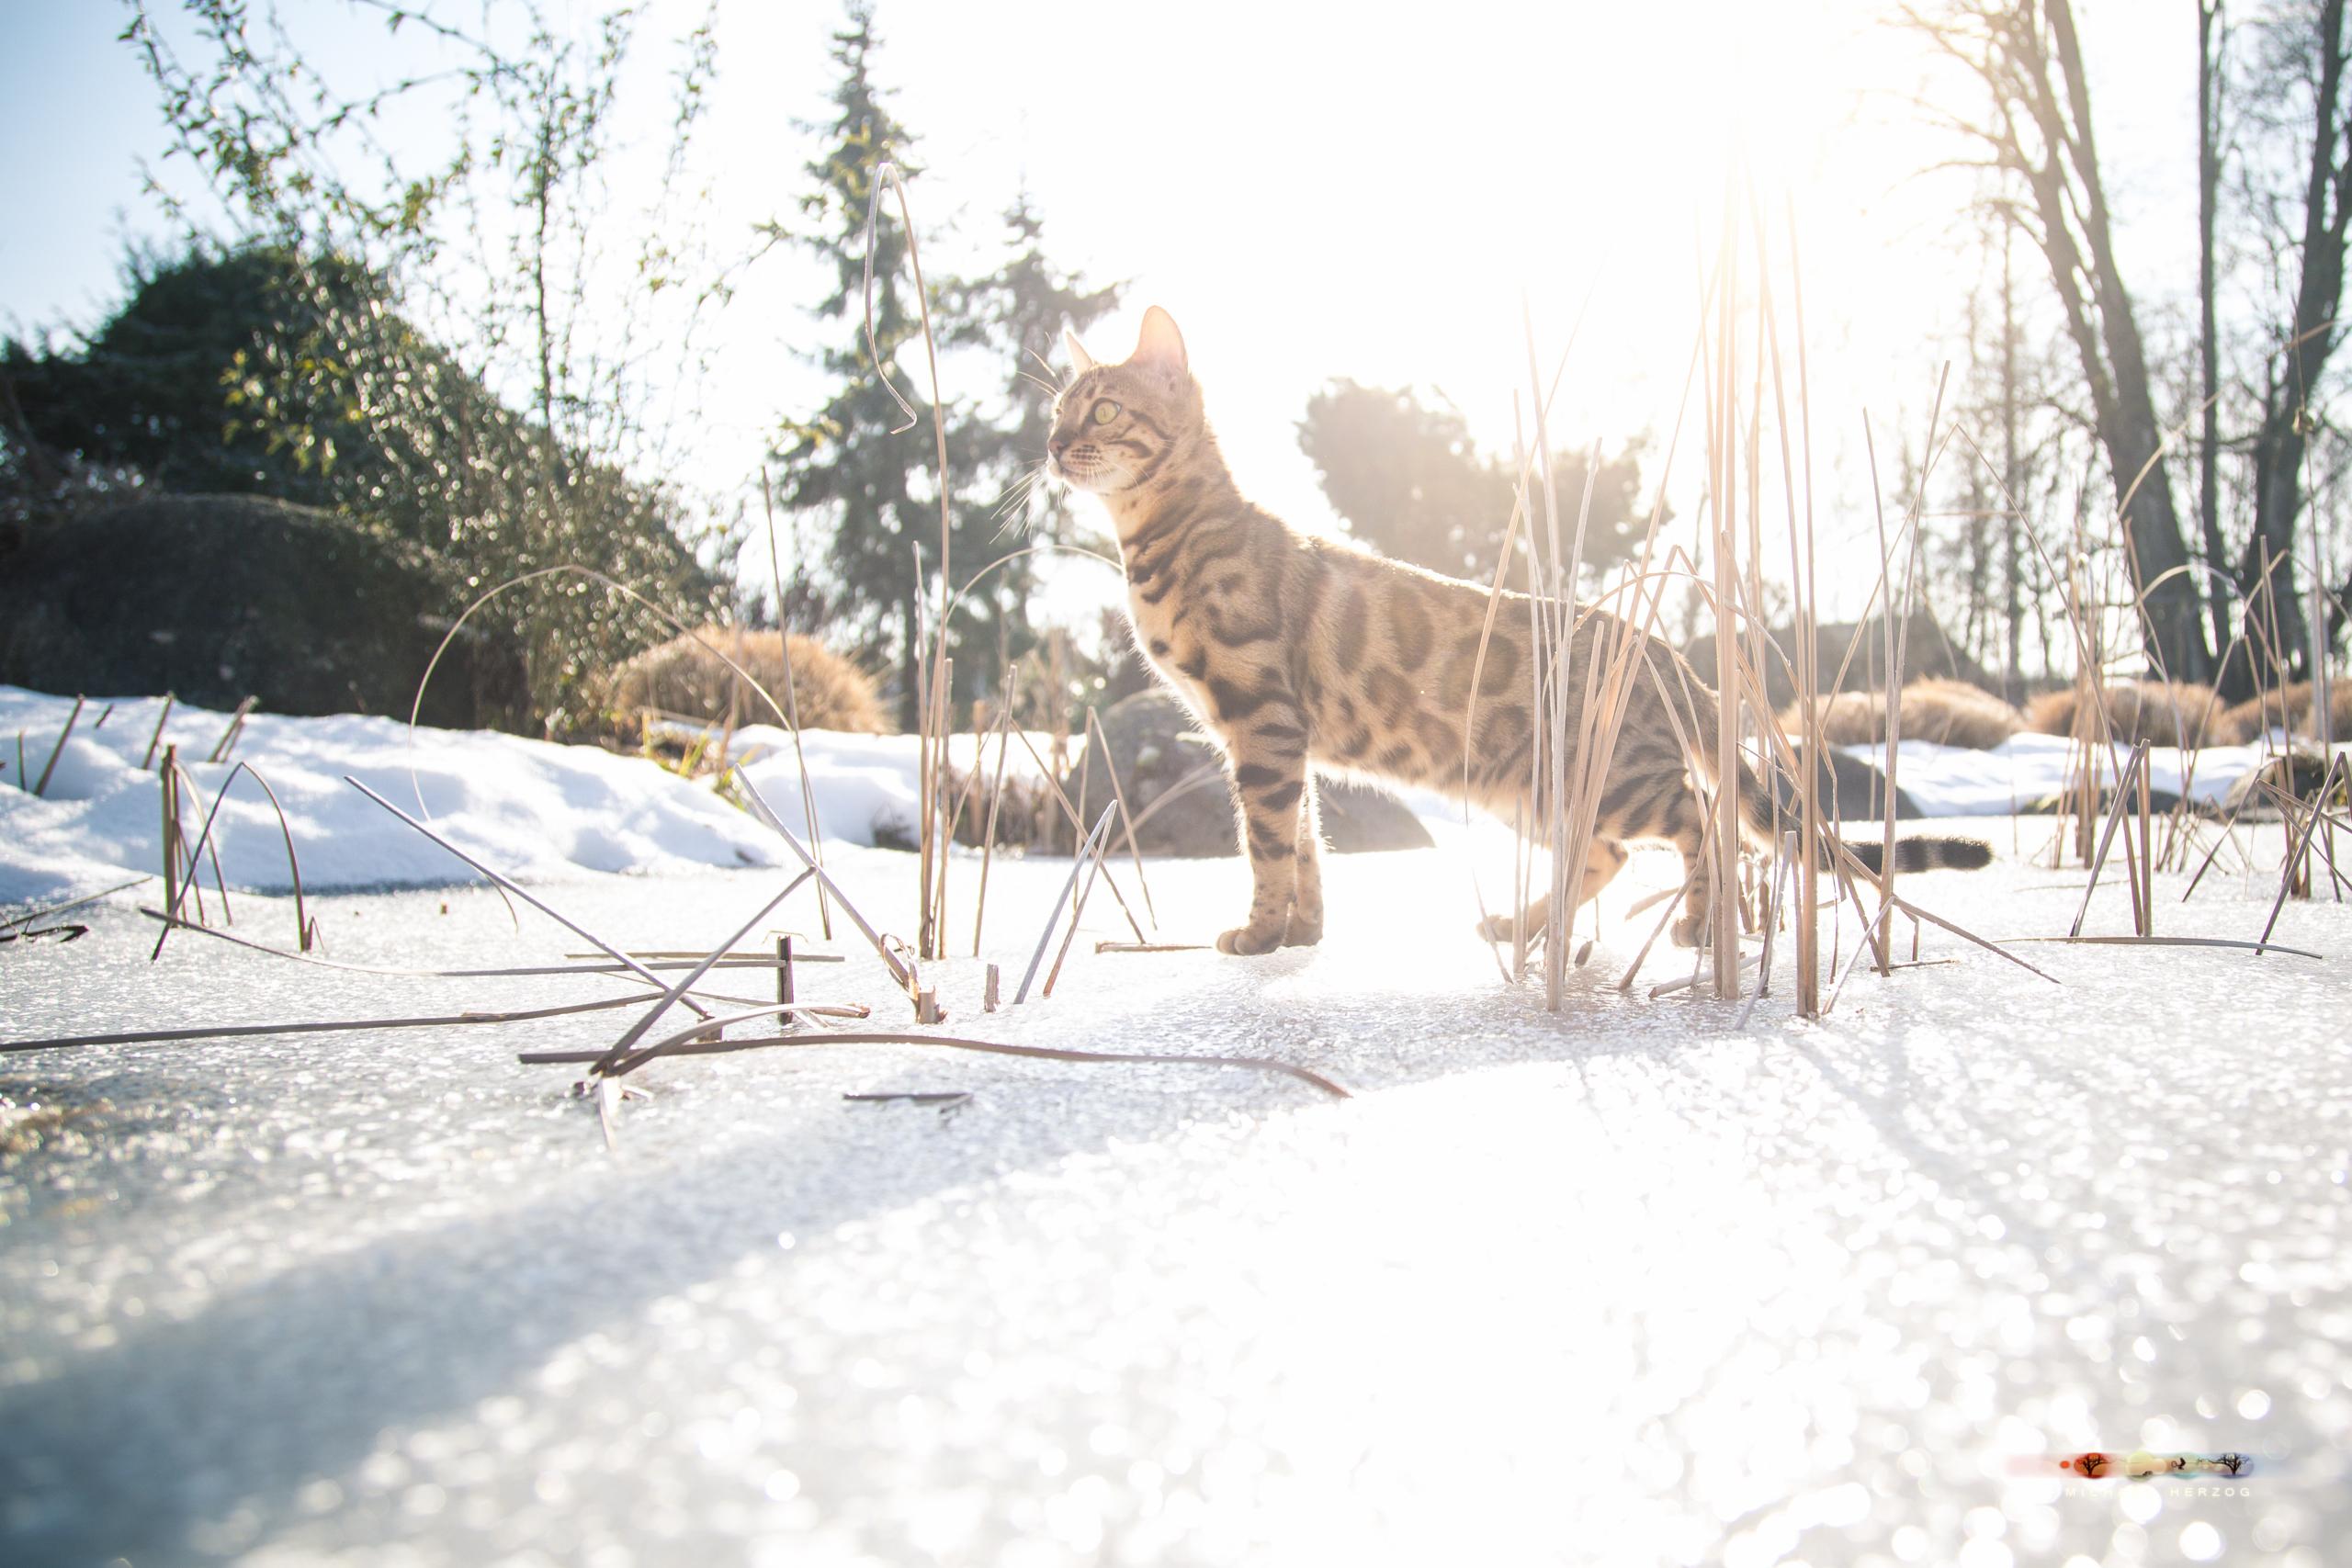 BALUARI_Winter2019_Garten_MichaelHerzog-8976.jpg